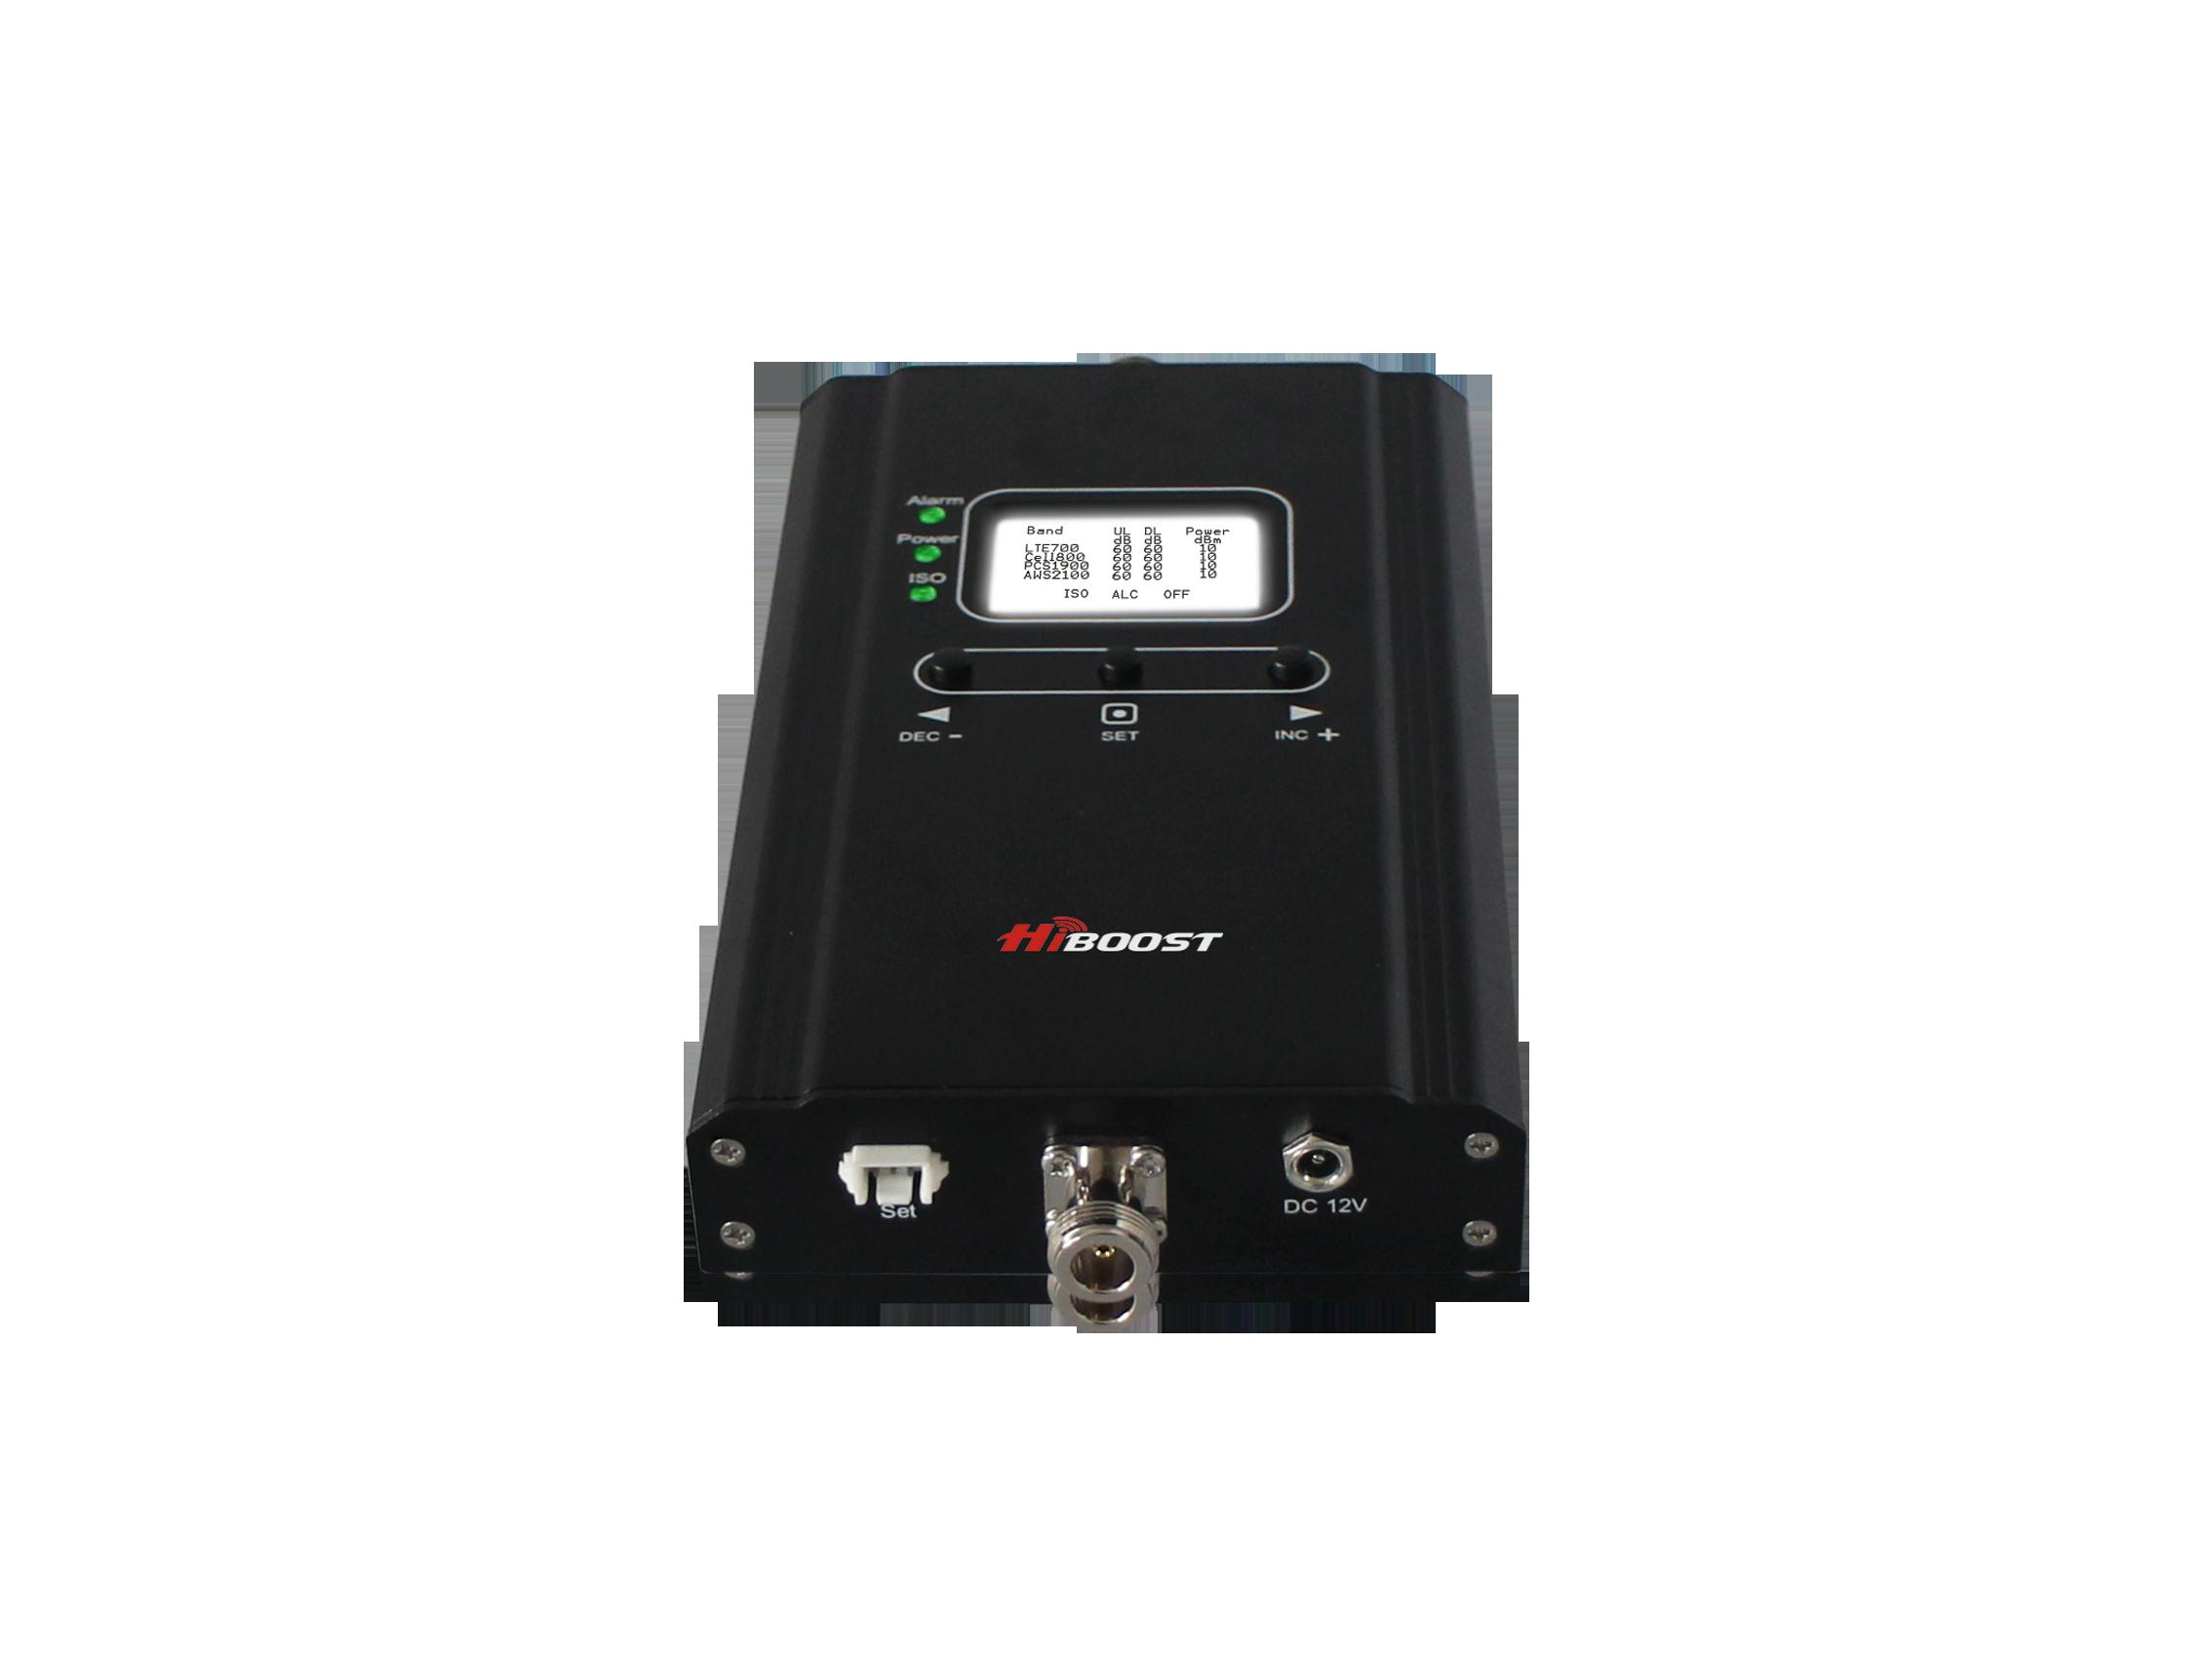 HOME 4K Smart Link - Hotspot Signal Booster - US HOME CELL PHONE